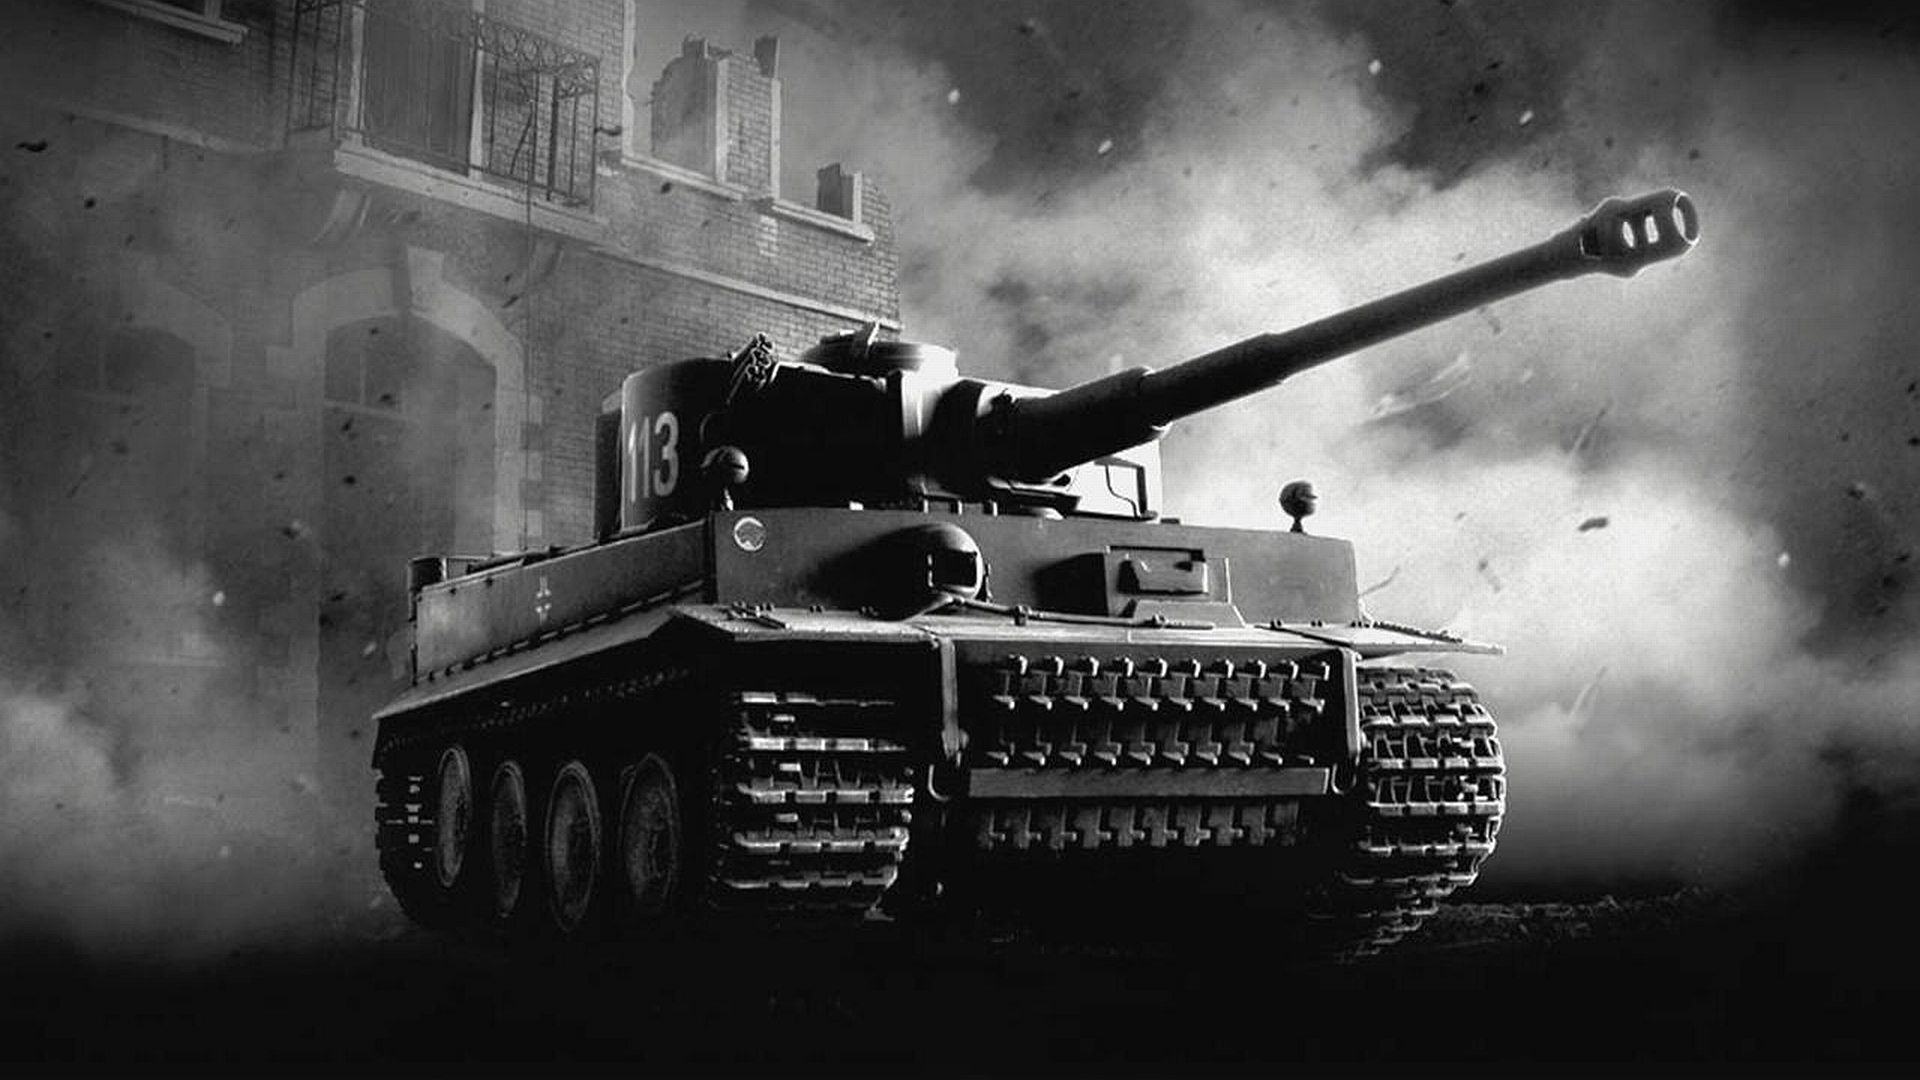 Old Tank Black High Definition Wallpaper Jpg 1920 1080 Tank Wallpaper Tanks Military Tiger Tank